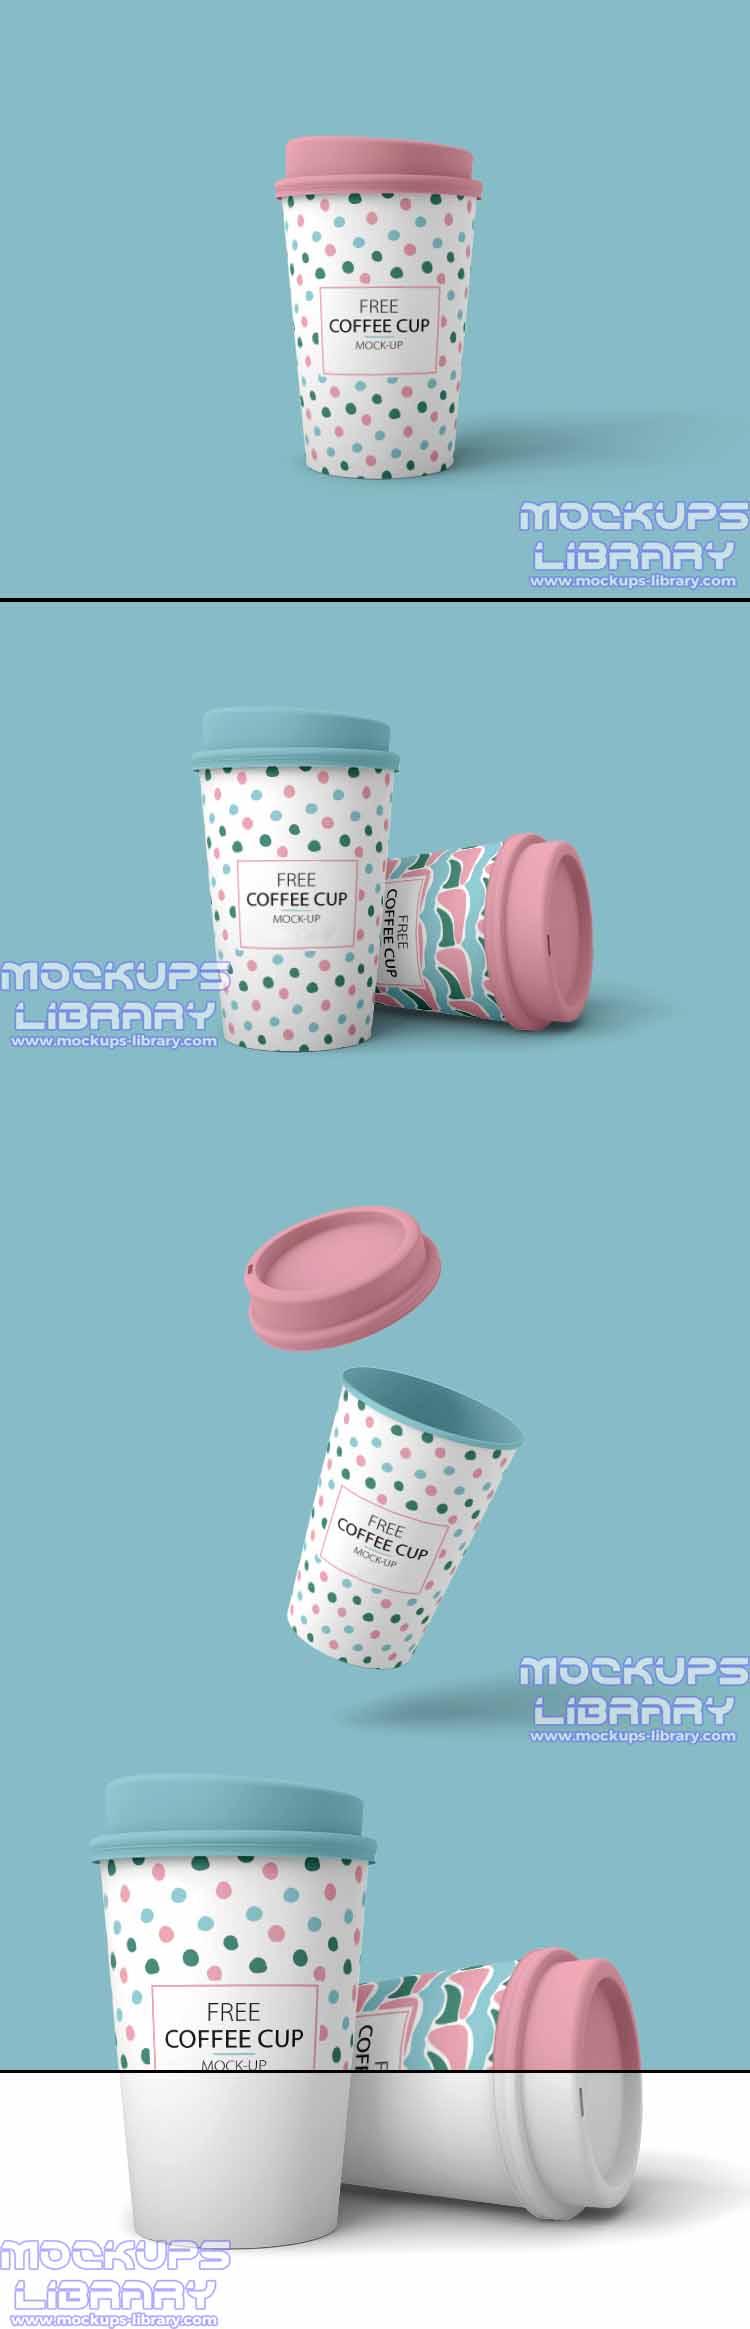 free cup mockup